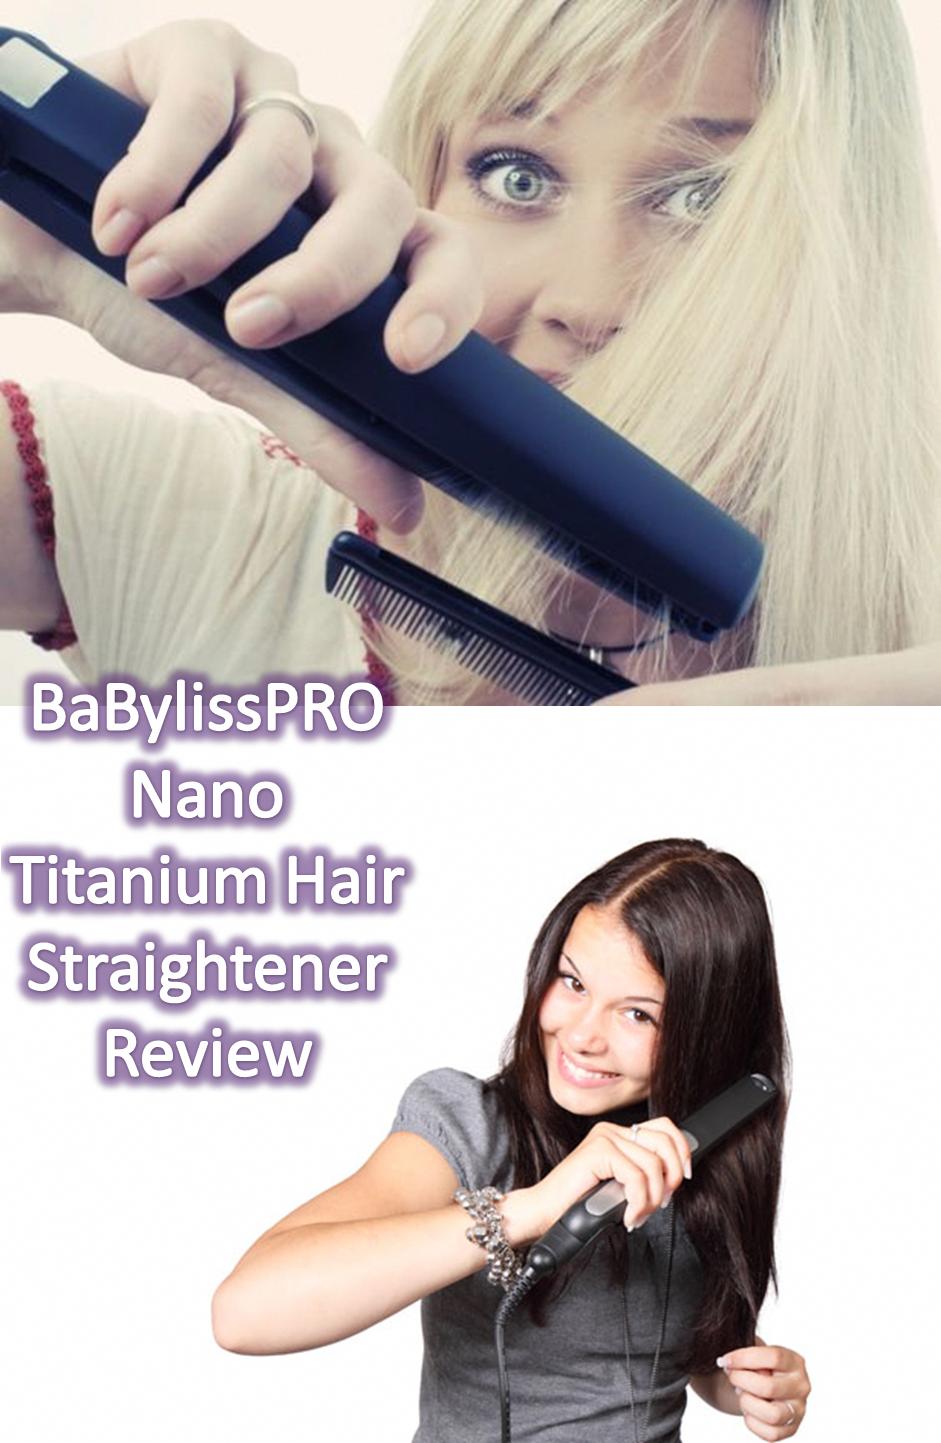 BaBylissPRO Nano Titanium Hair Straightener is one of the